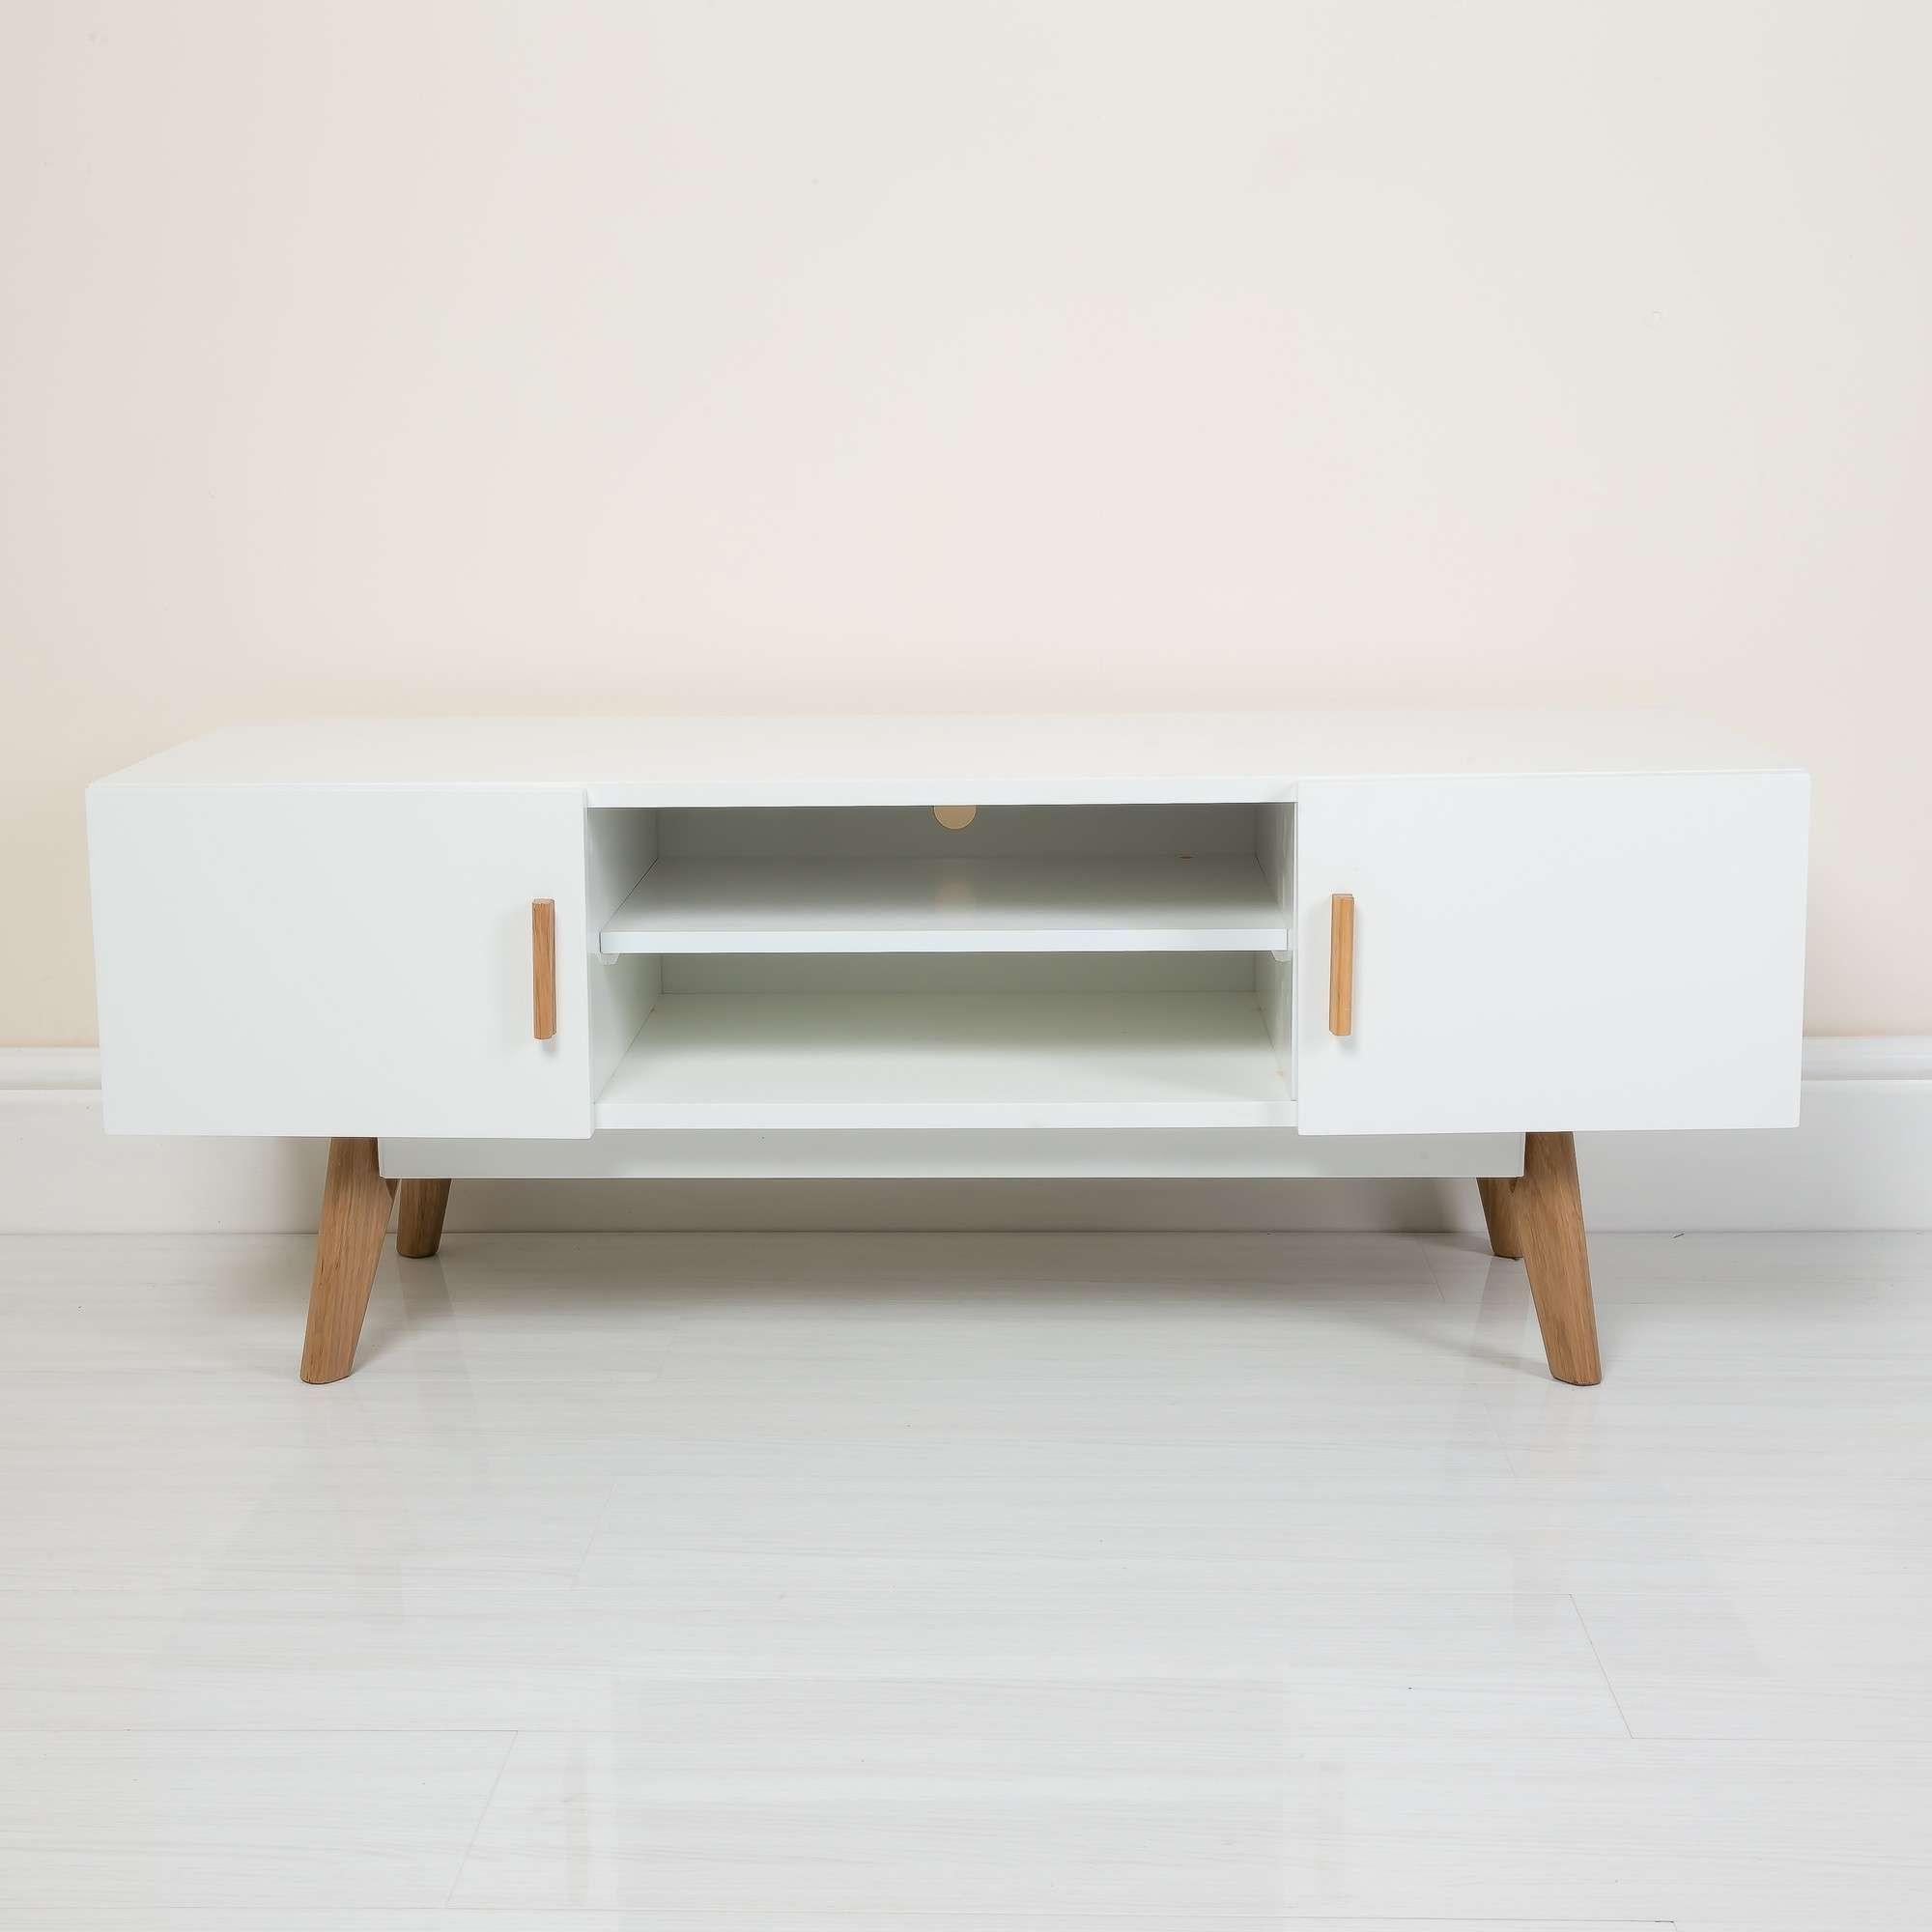 Tv : Likable Scandinavian Tv Stand Uk Brilliant Scandinavian For Scandinavian Design Tv Cabinets (View 9 of 20)